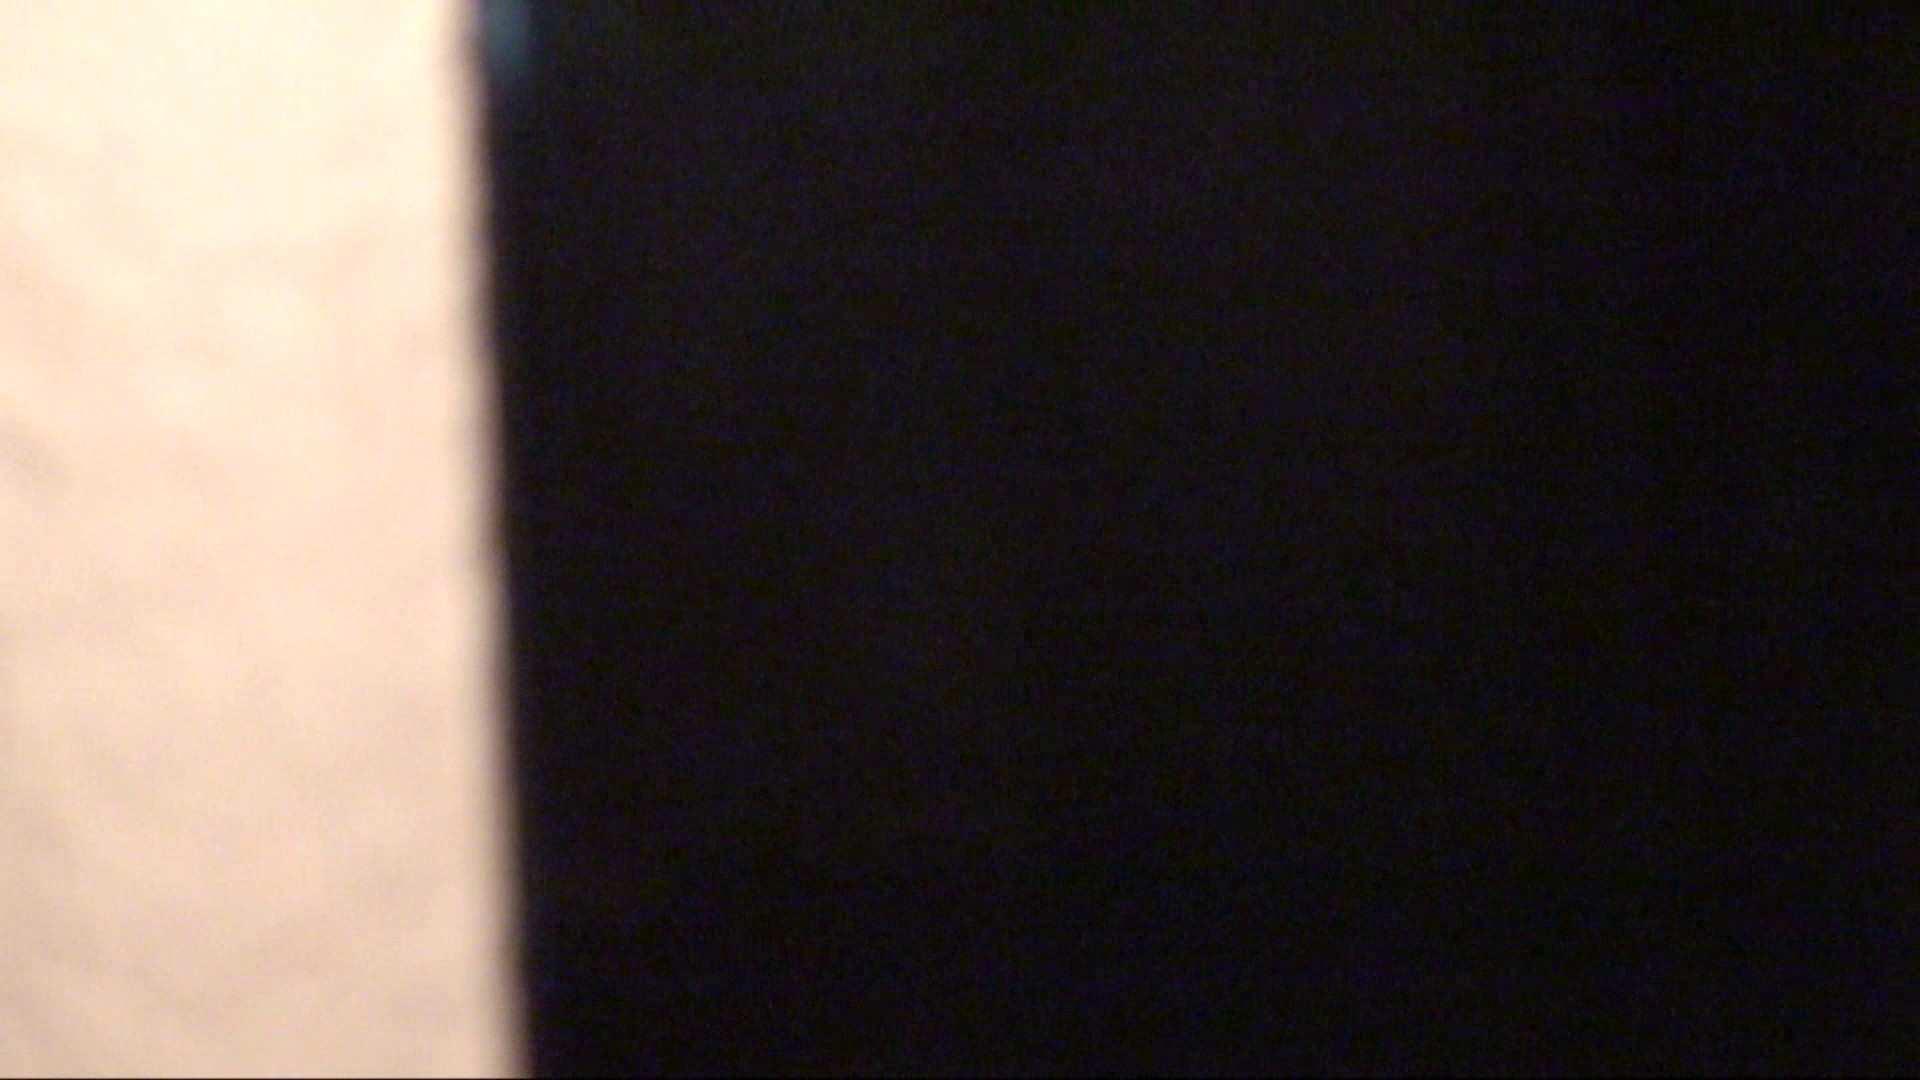 vol.01必見!白肌嬢の乳首が丸見え。極上美人のすっぴん顔をハイビジョンで! 覗き | 全身丸見え  43連発 11